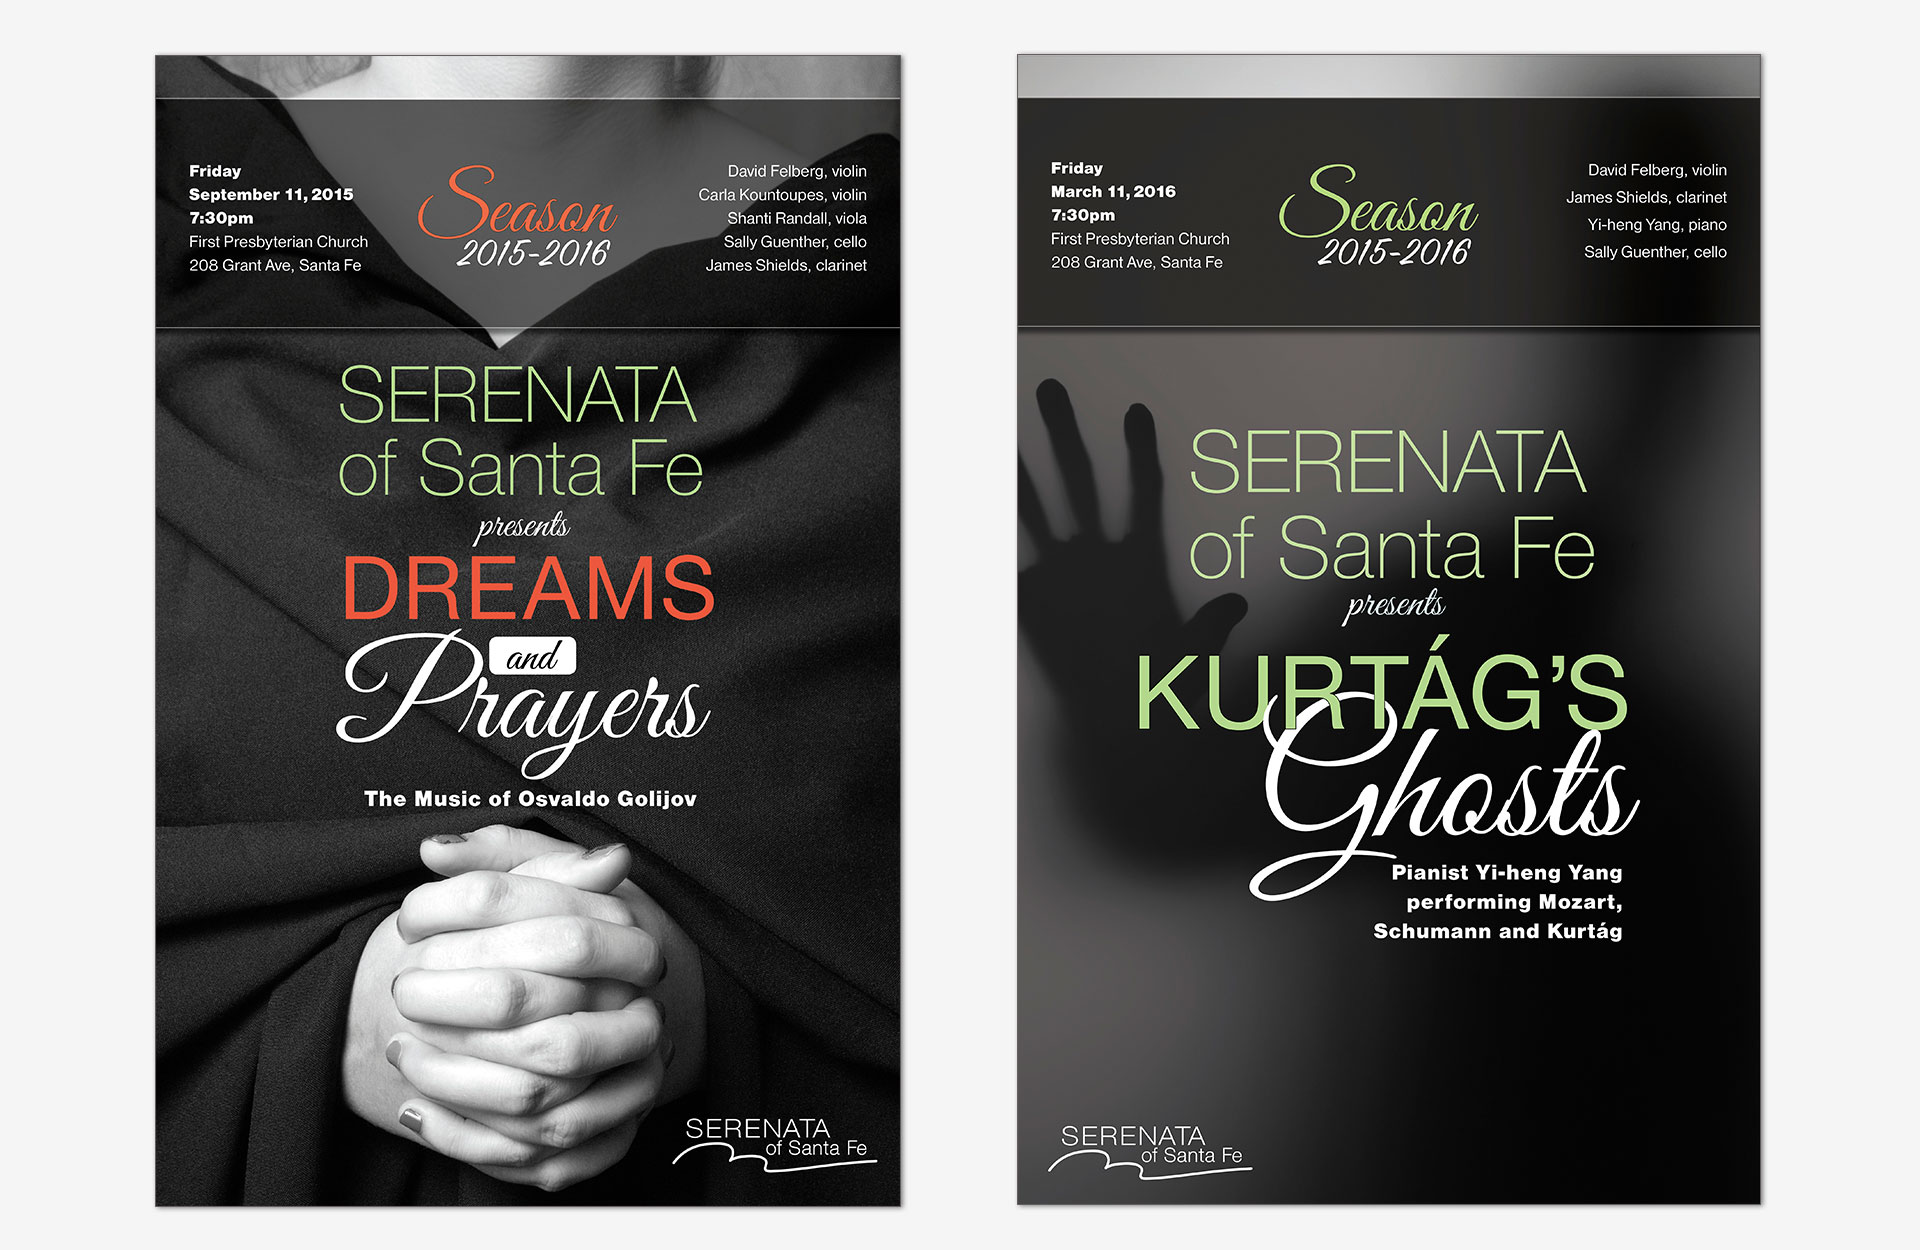 Serenata of Santa Fe Posters